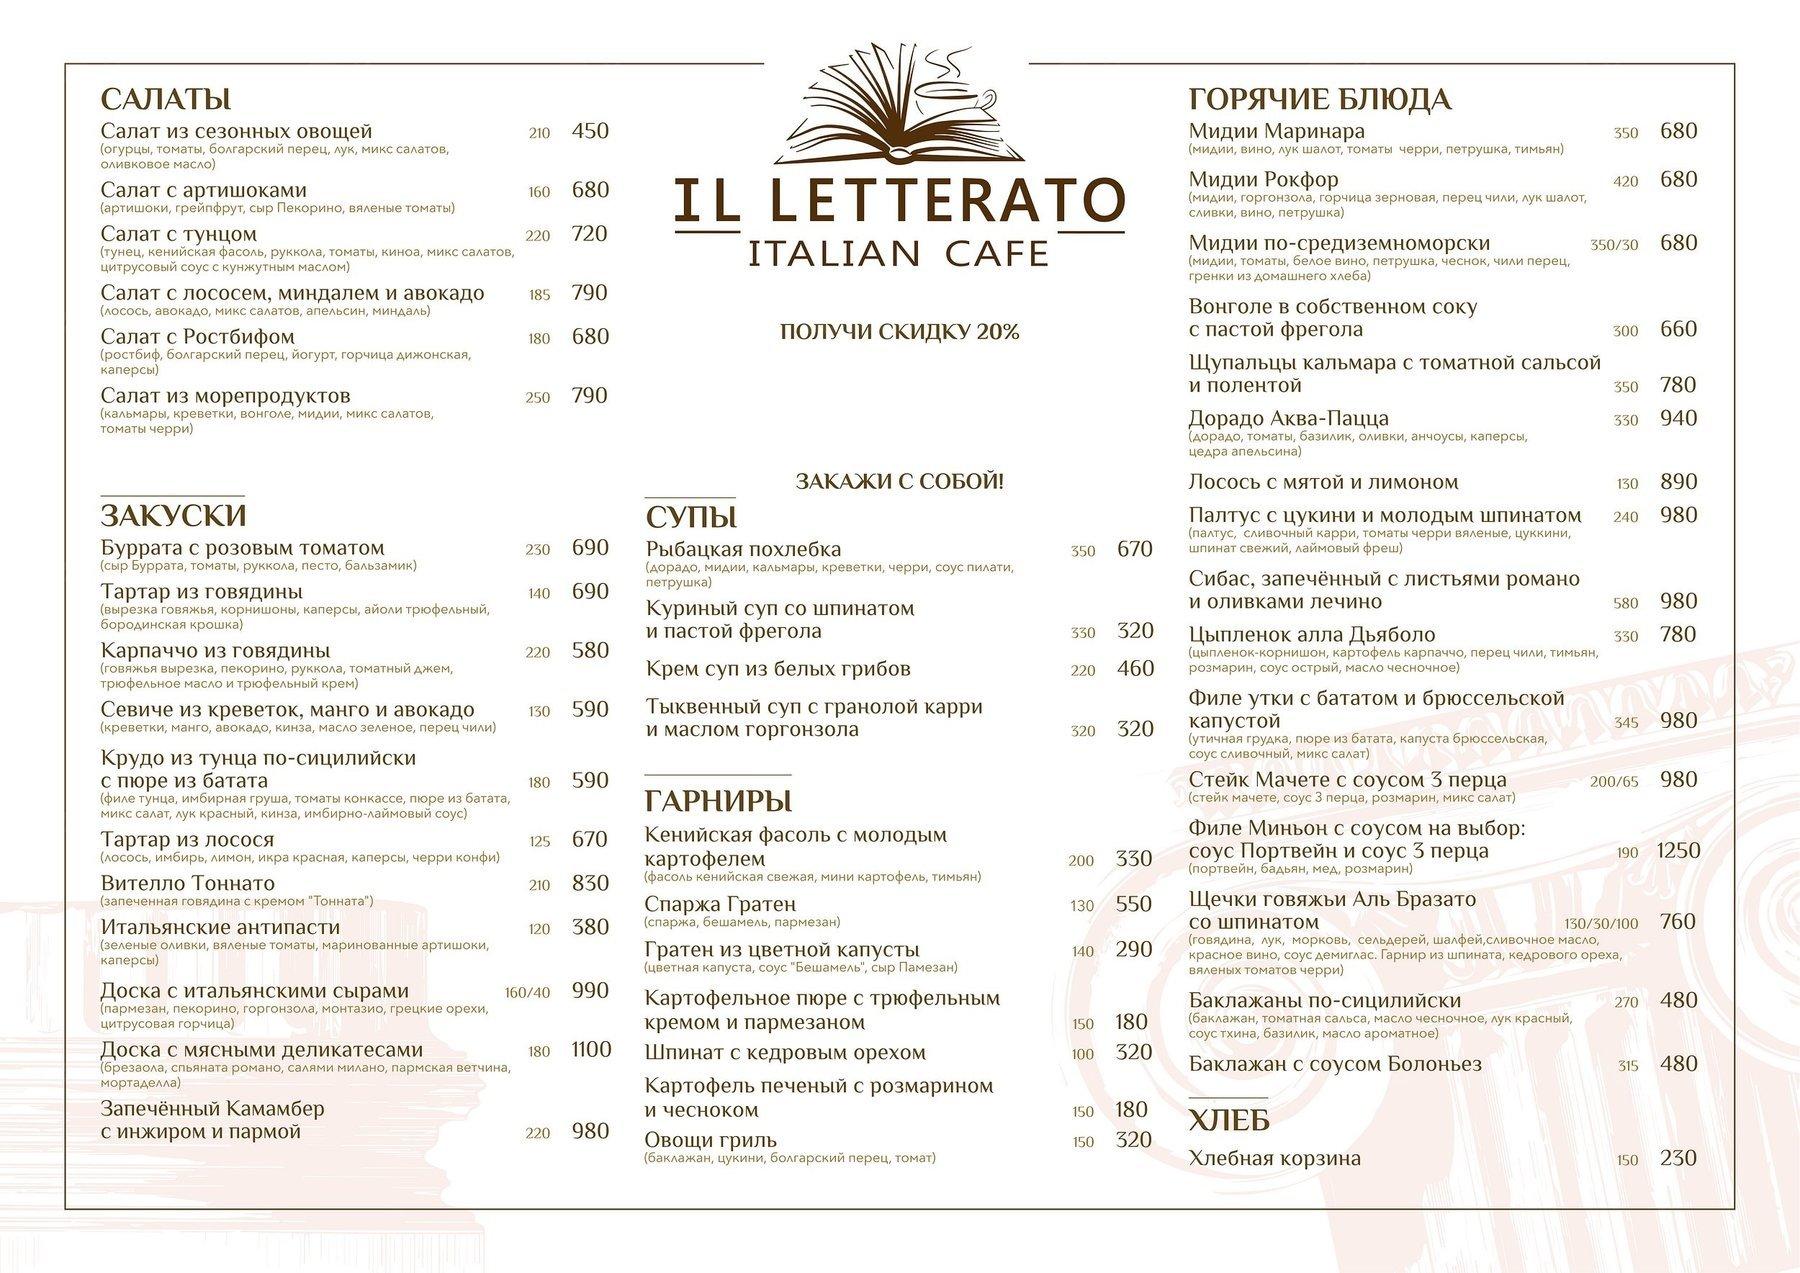 Меню ресторана IL LETTERATO (Литератор) в Петроверигском переулке фото 1